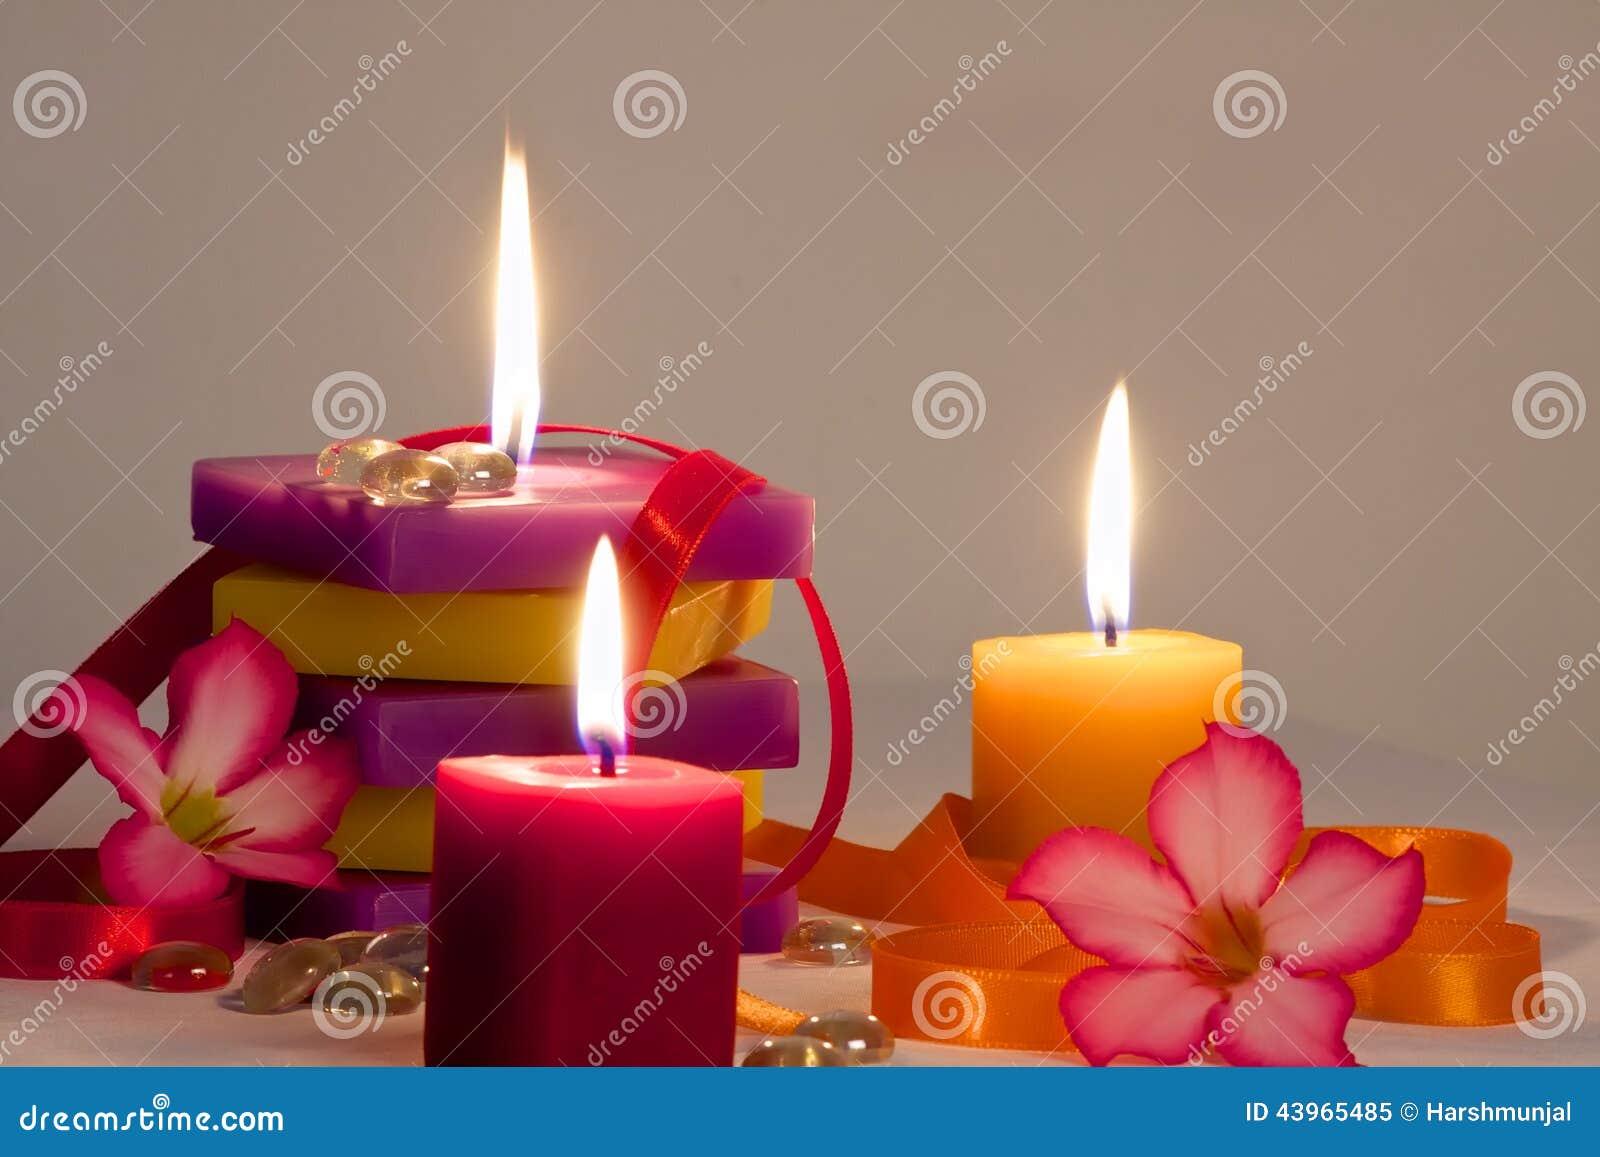 fond floral avec les bougies allum es photo stock image 43965485. Black Bedroom Furniture Sets. Home Design Ideas